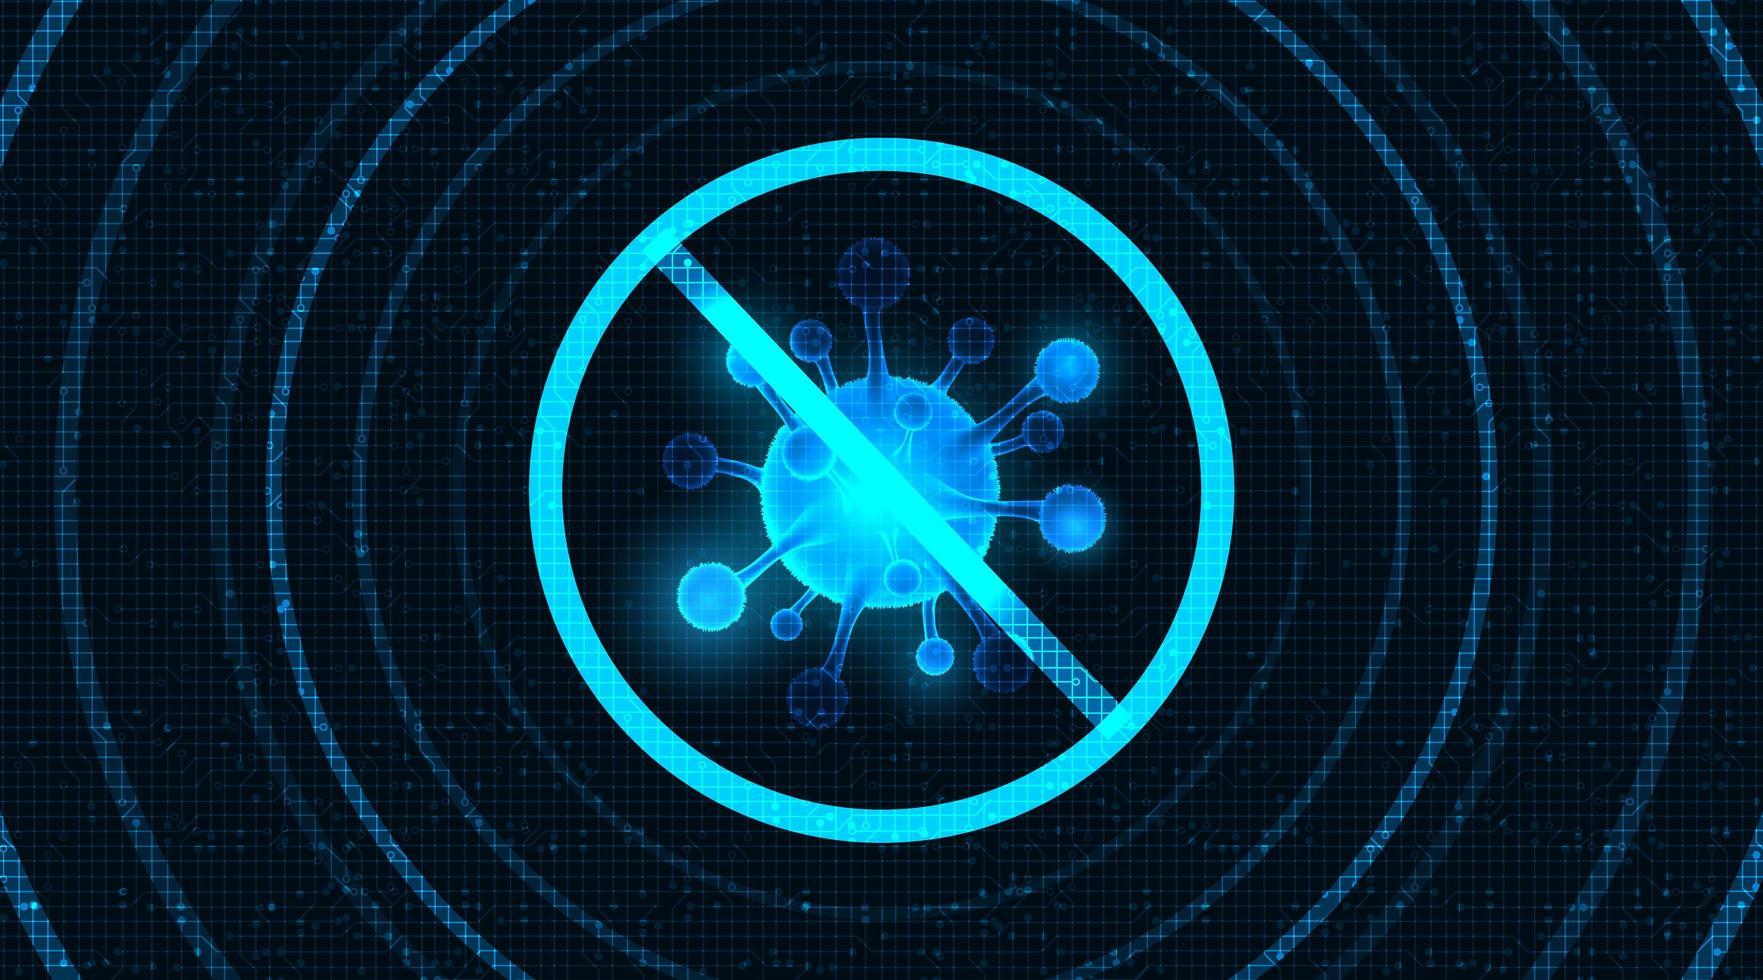 tecnologia covid-19 design de célula vetor